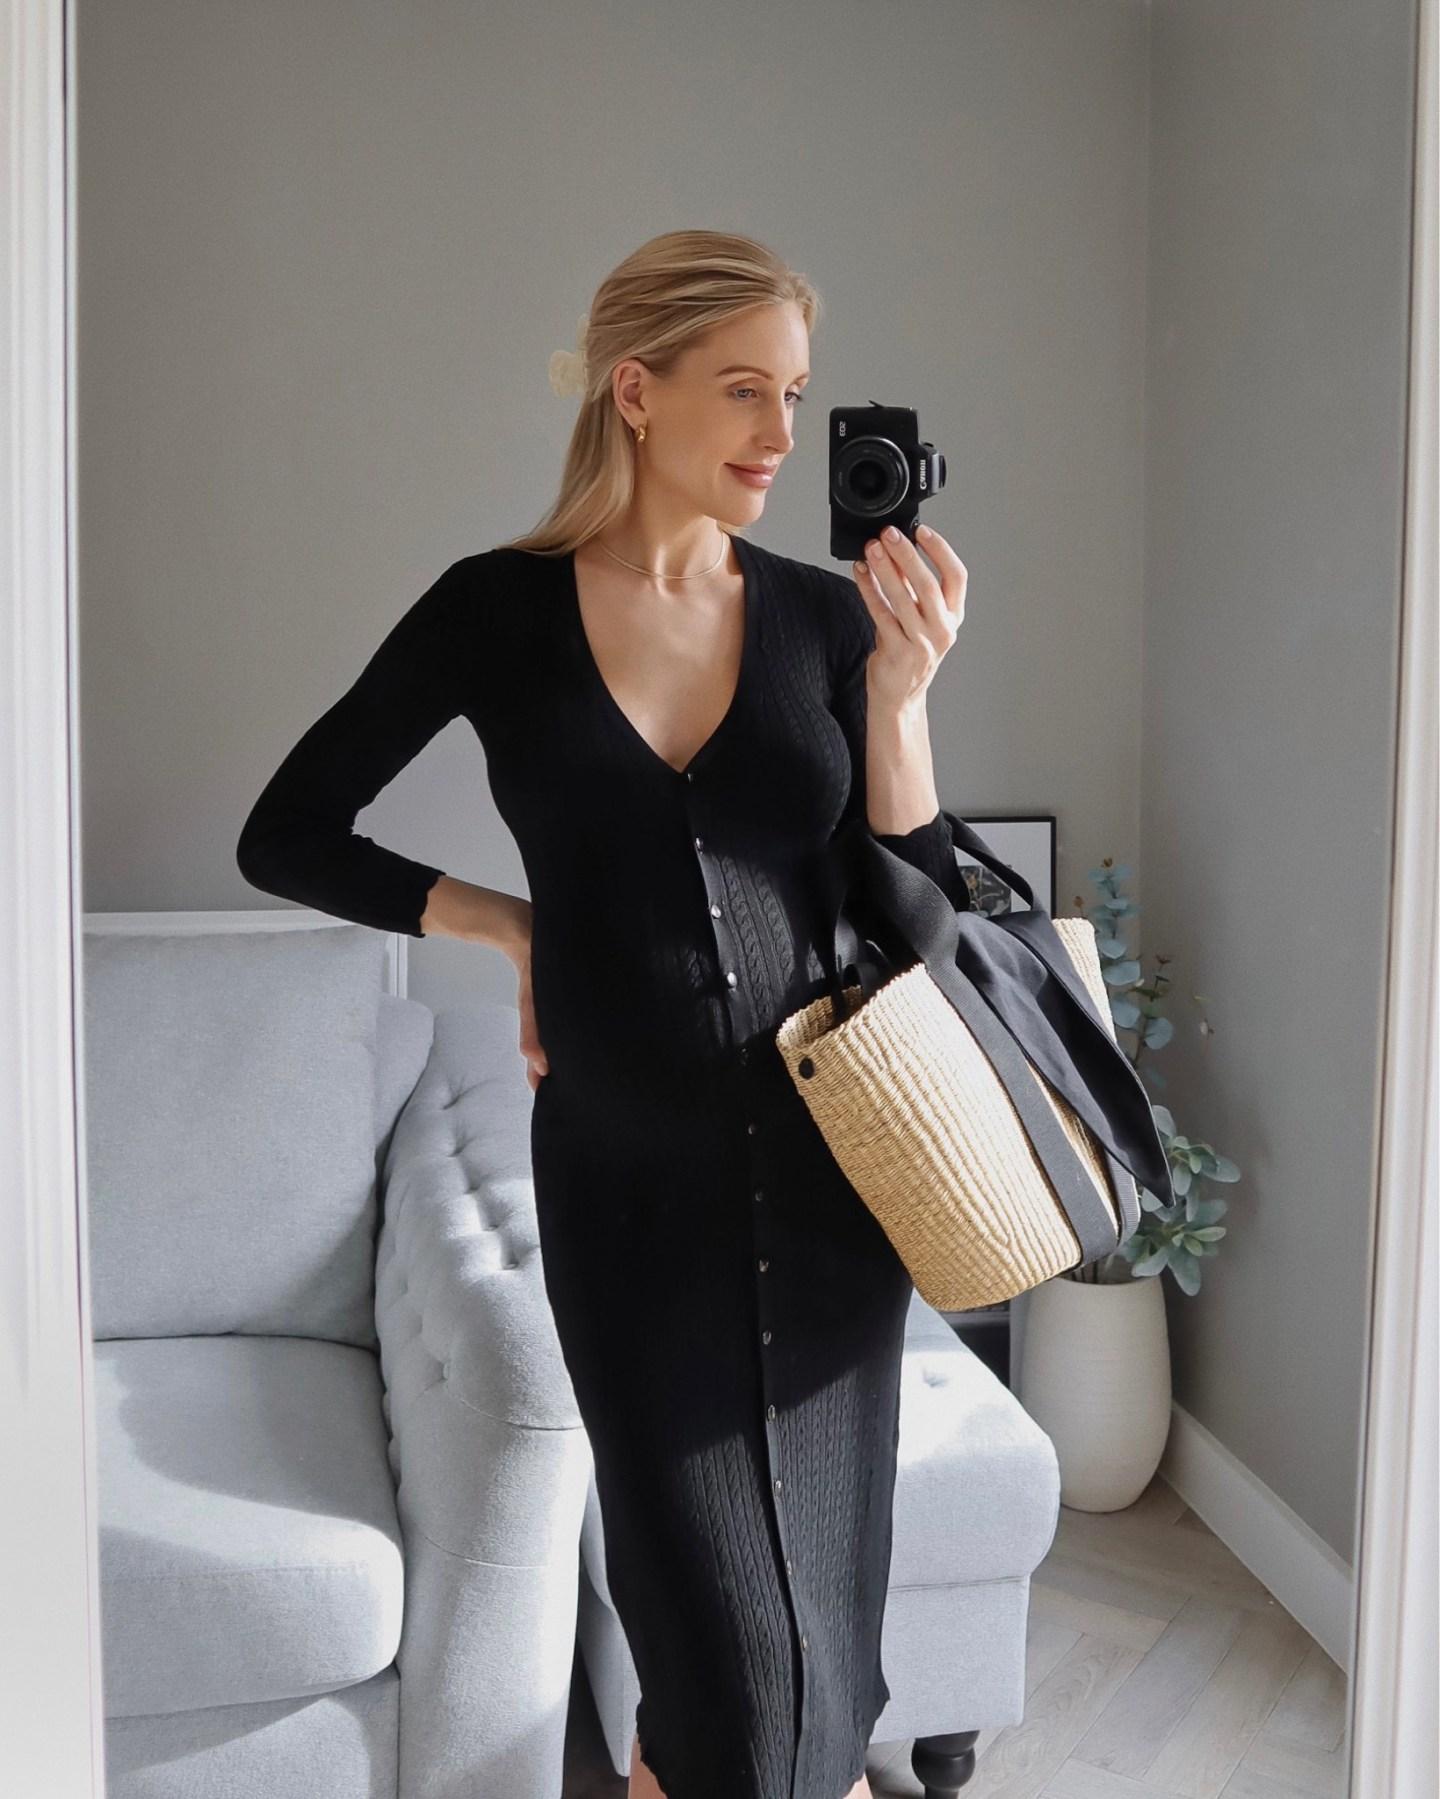 Muun straw basket bag with Sezane black knitted dress